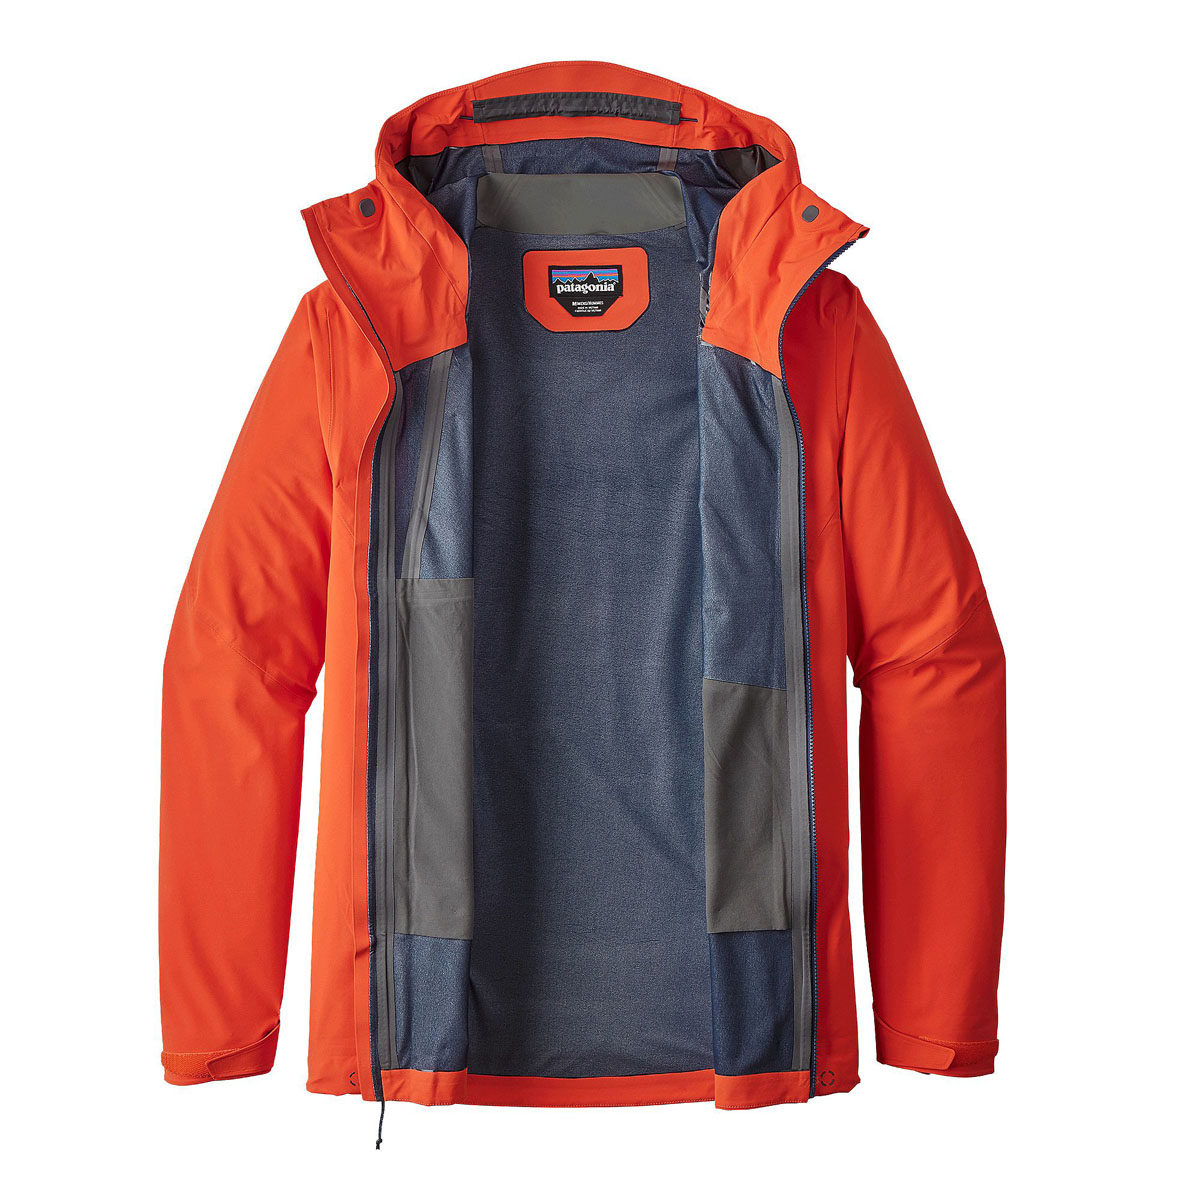 Patagonia Galvanized Jacket Men Technical Jackets